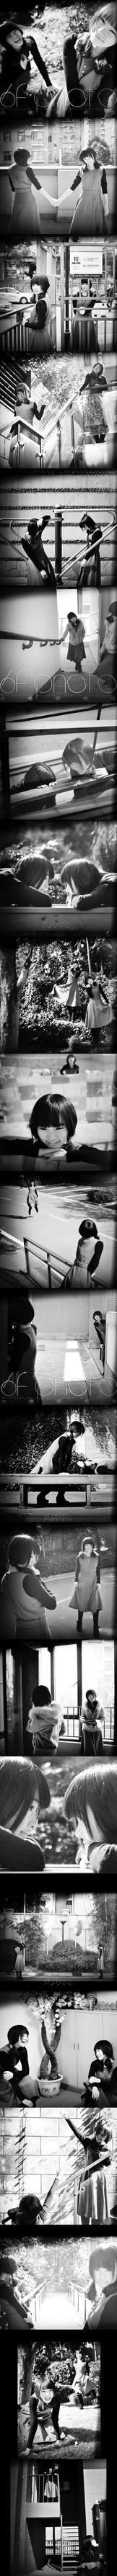 Singles Day of Lulu by D4D1